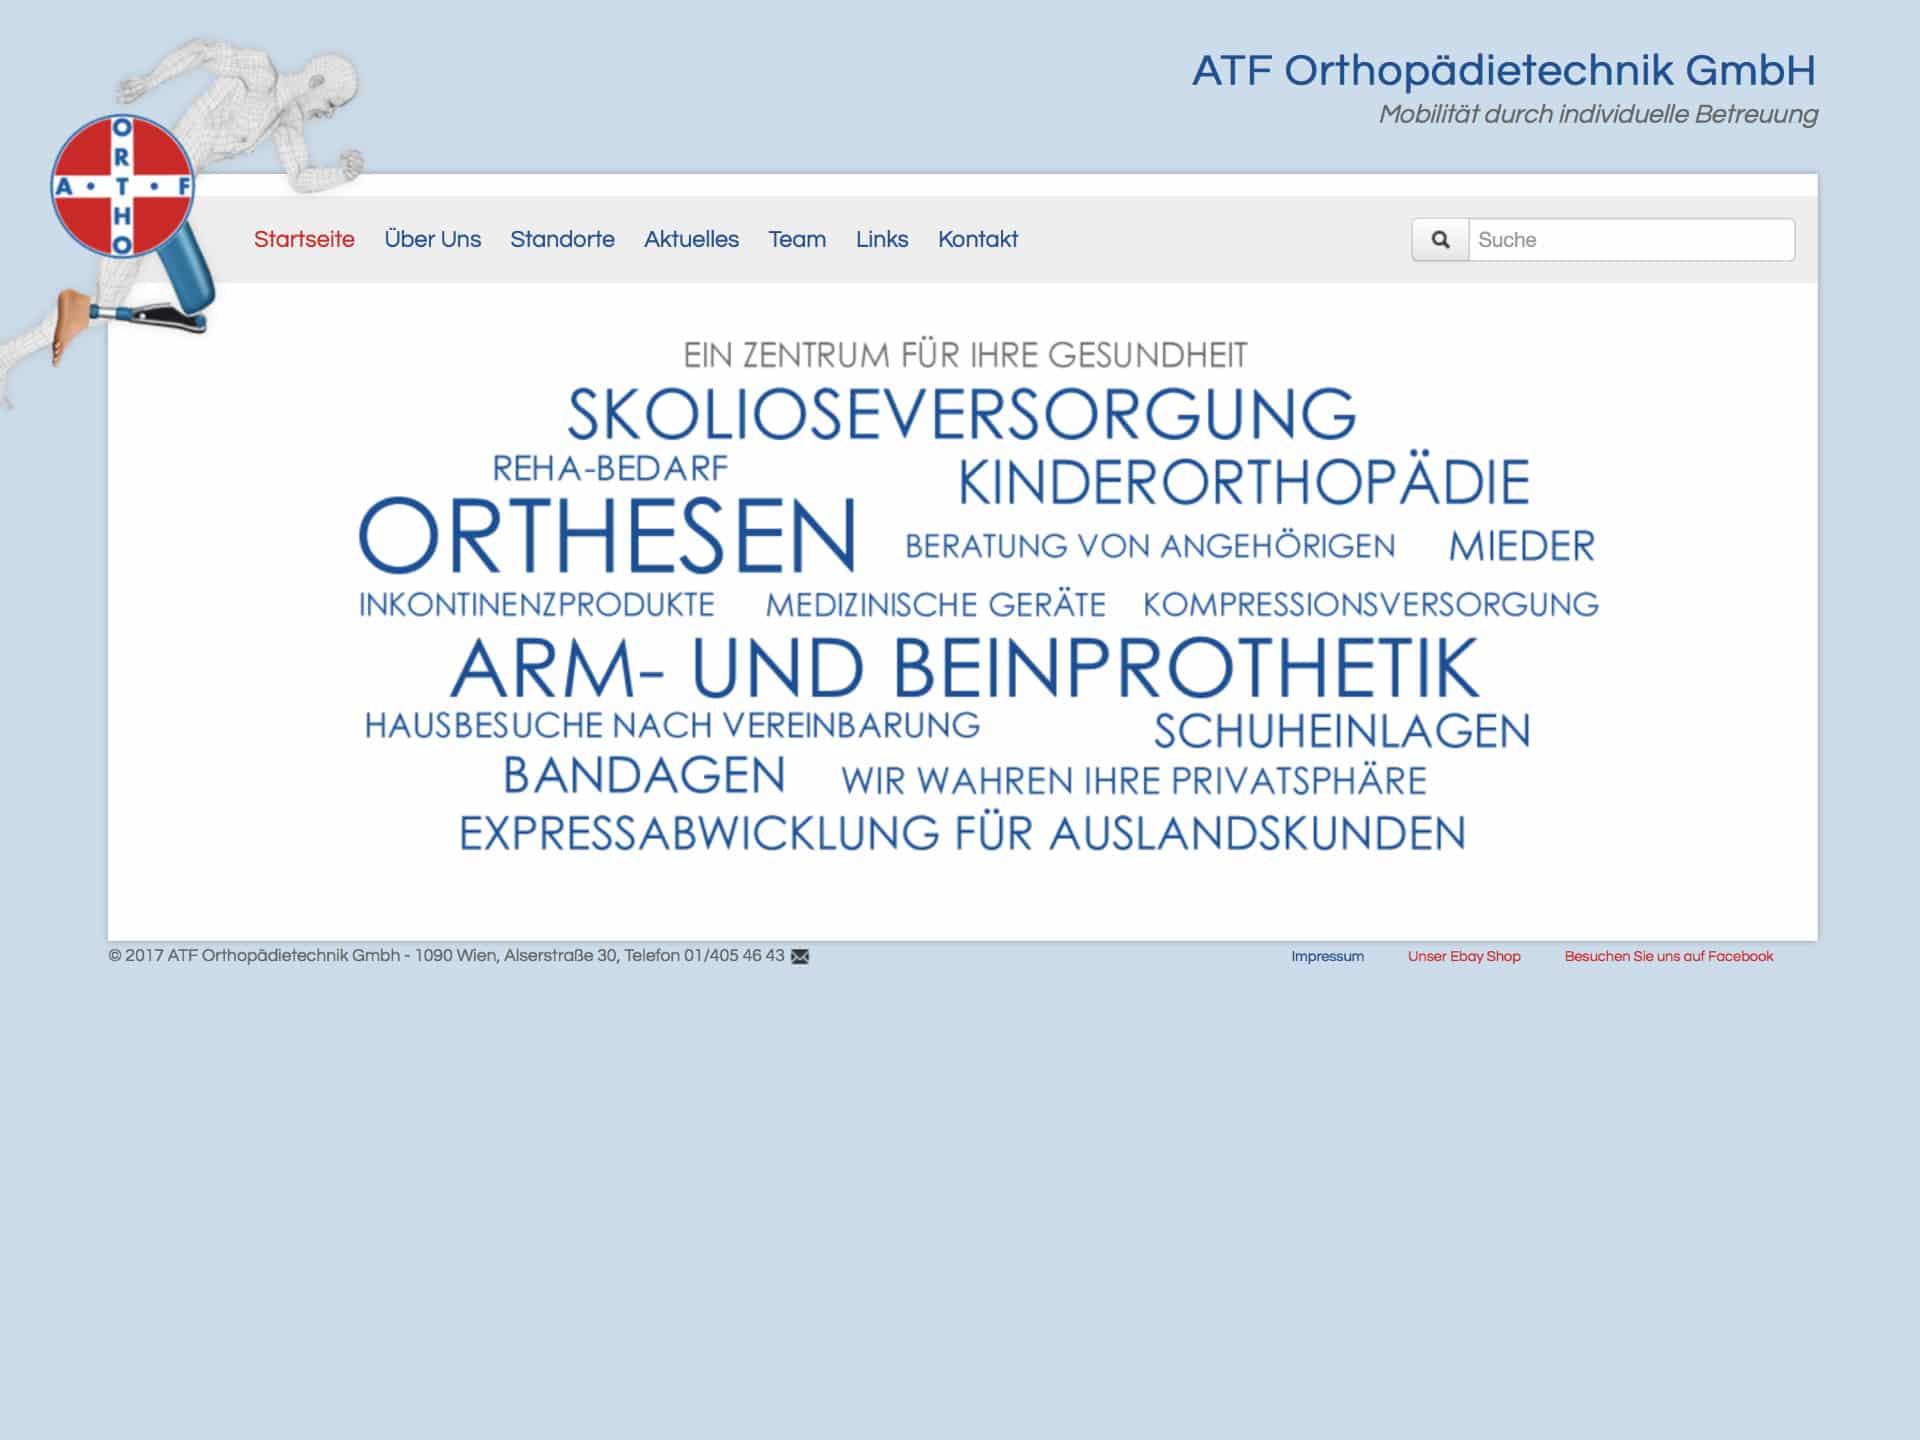 Atf Orthopaedietechnik